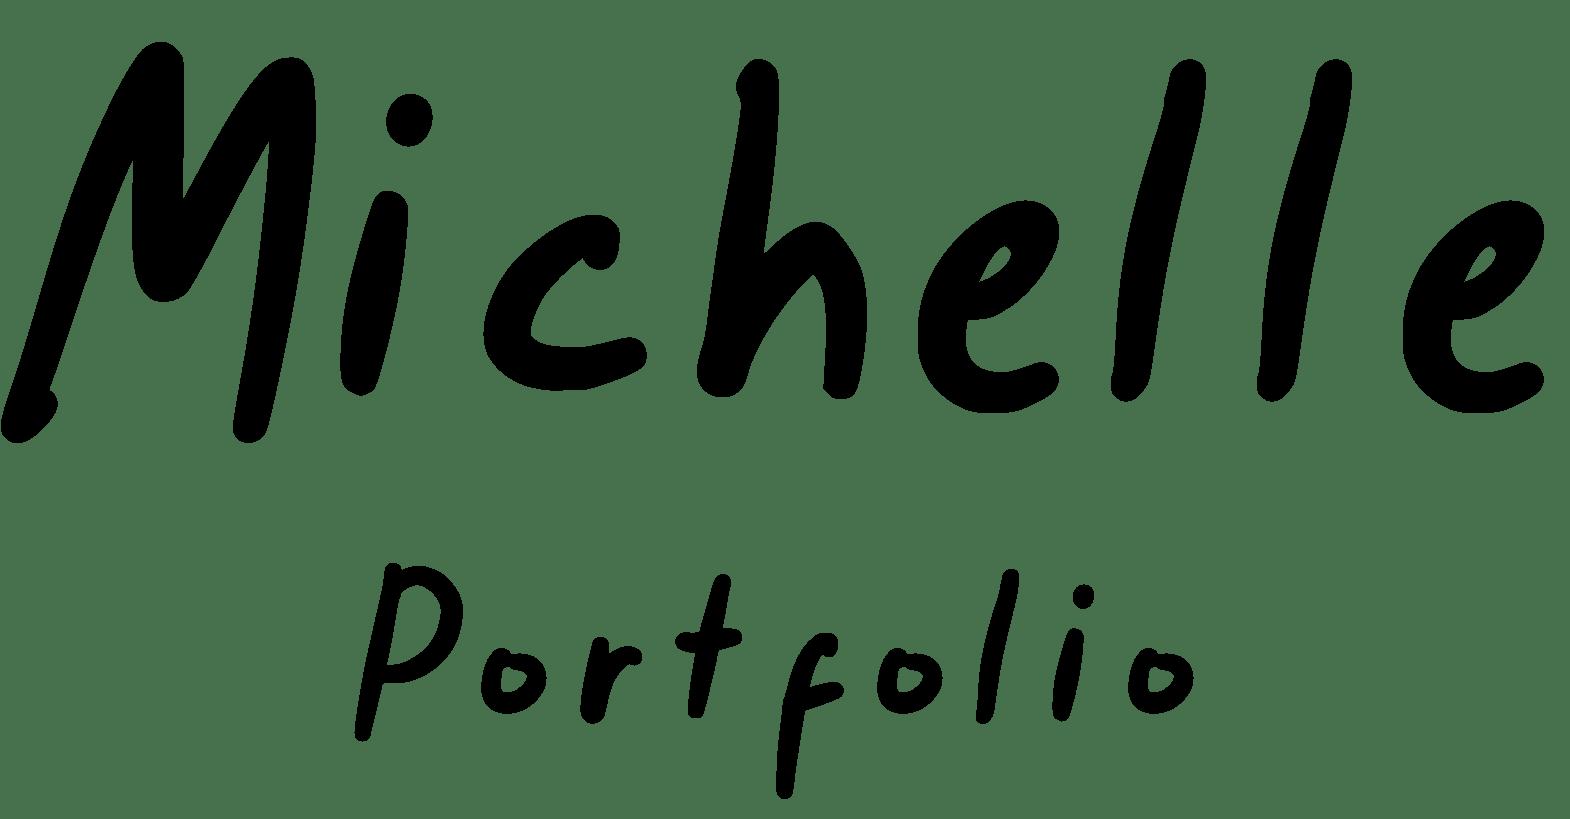 MICHELLE Portfolio